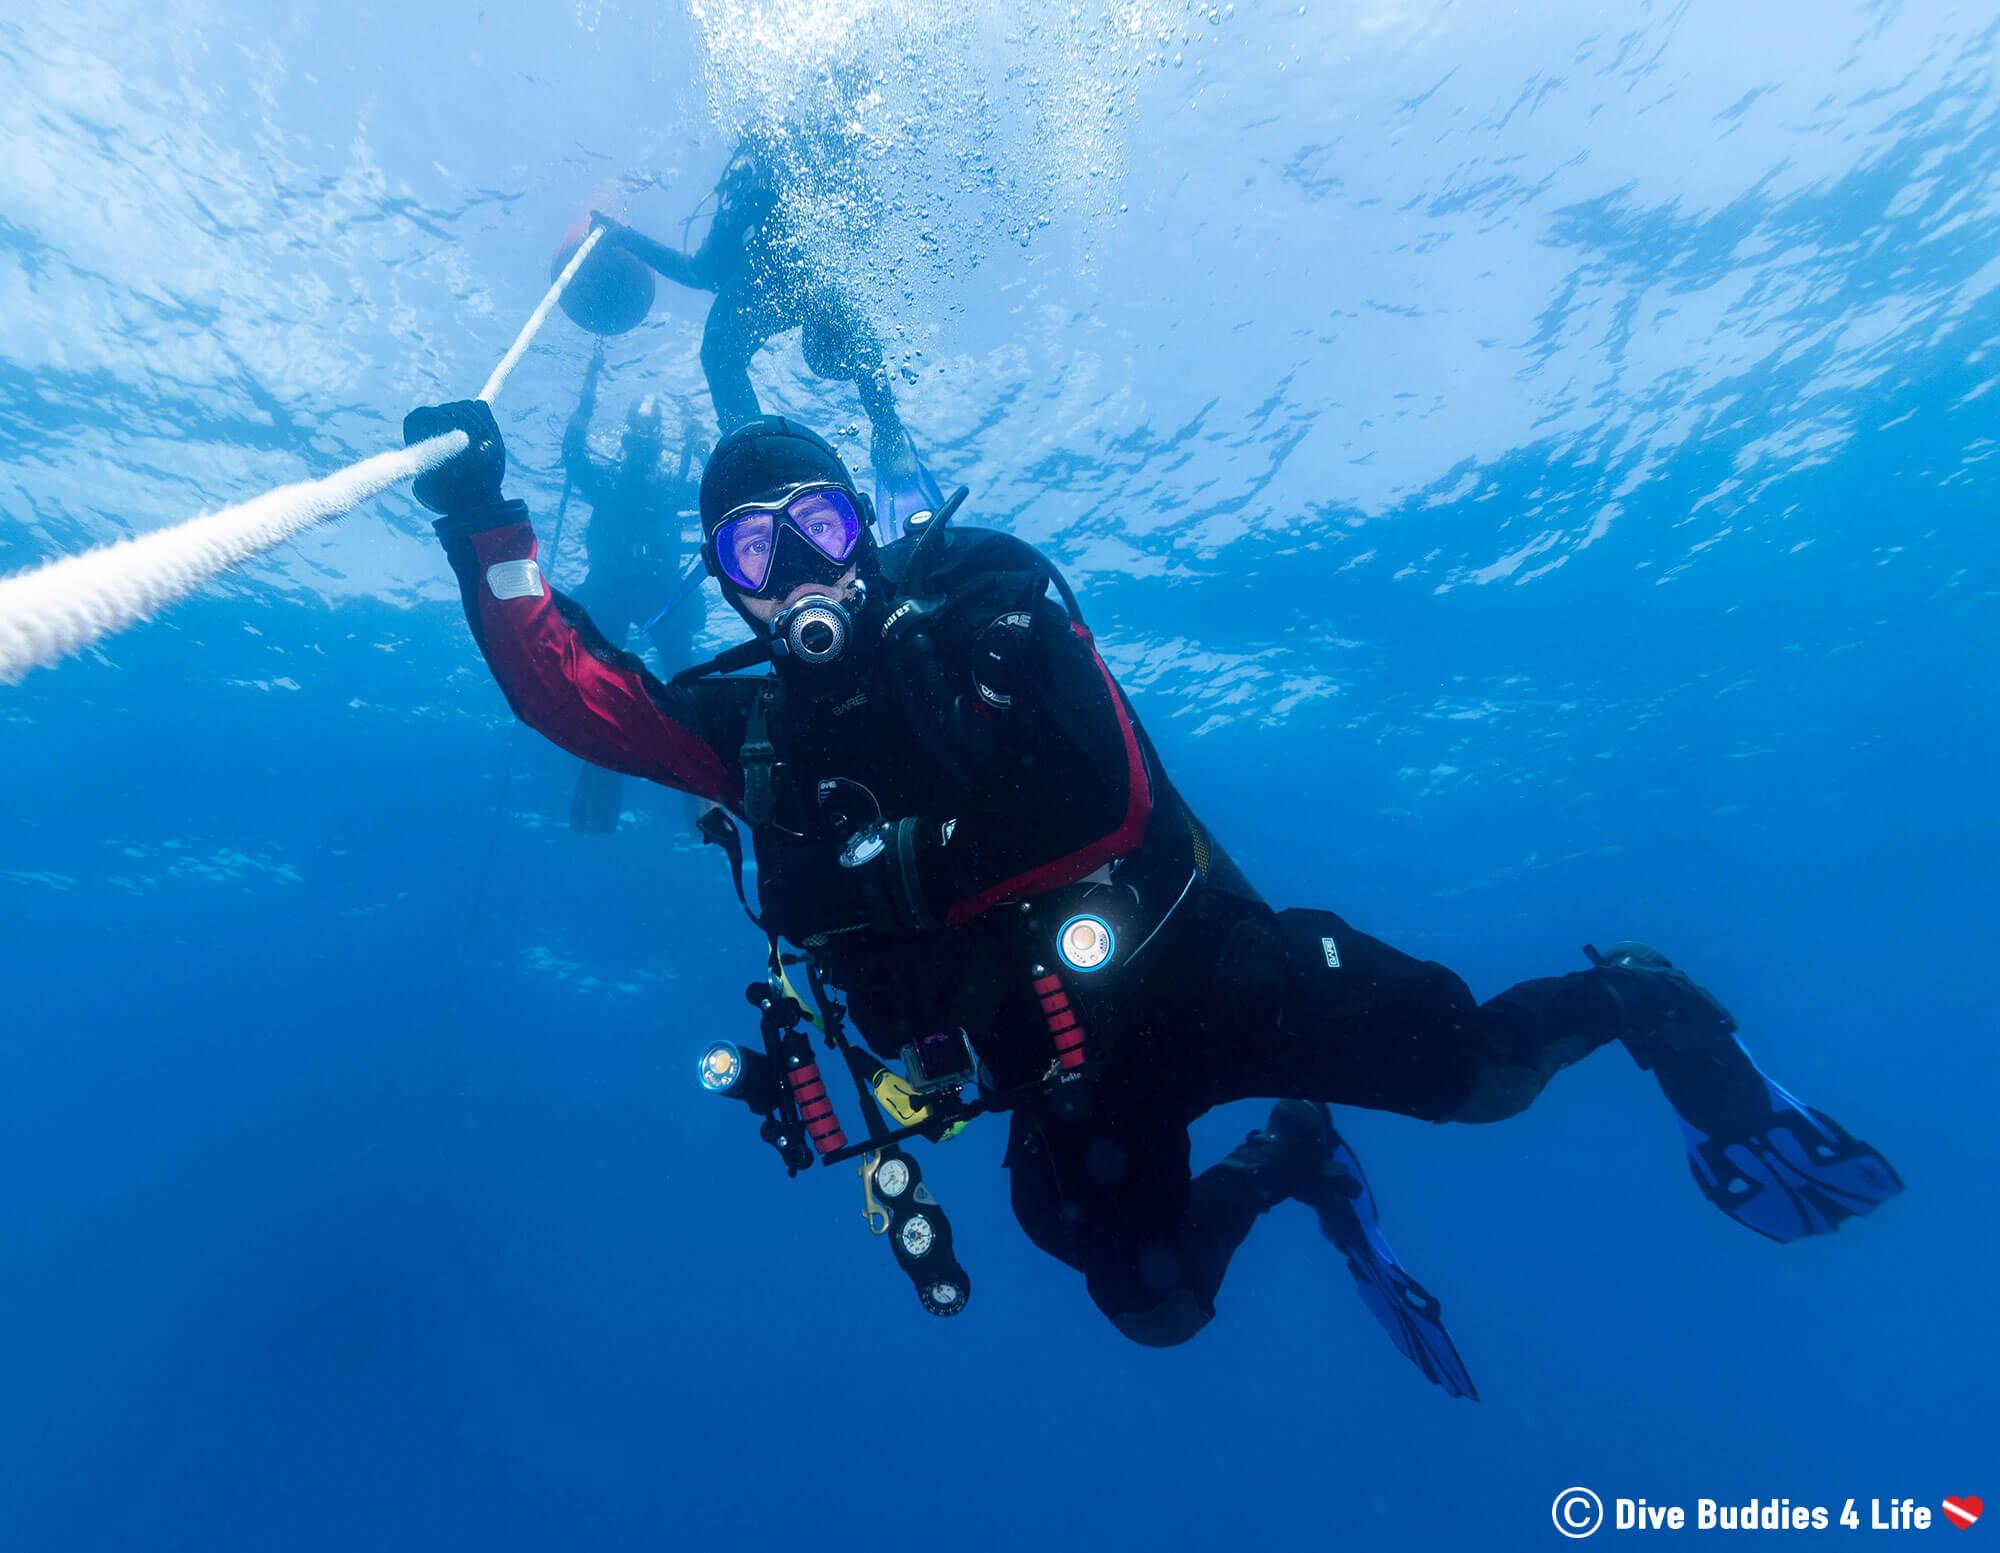 Joey Descending Down The Anchore Line In Spain's Marine Park Islas Hormigas